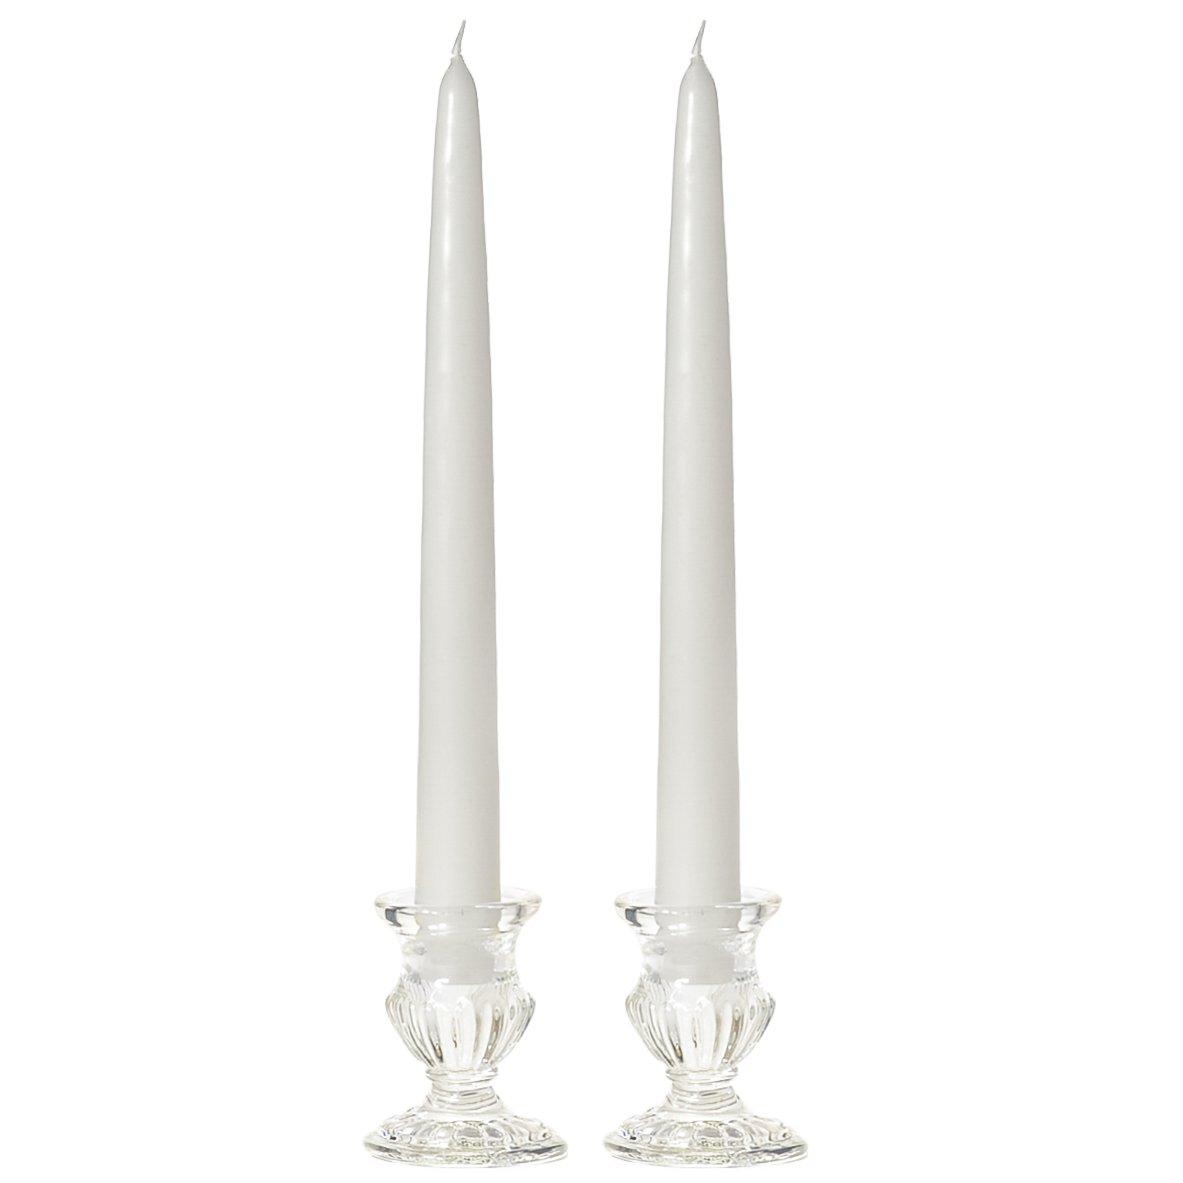 White Taper Candles 10 12 Pack Vot-062